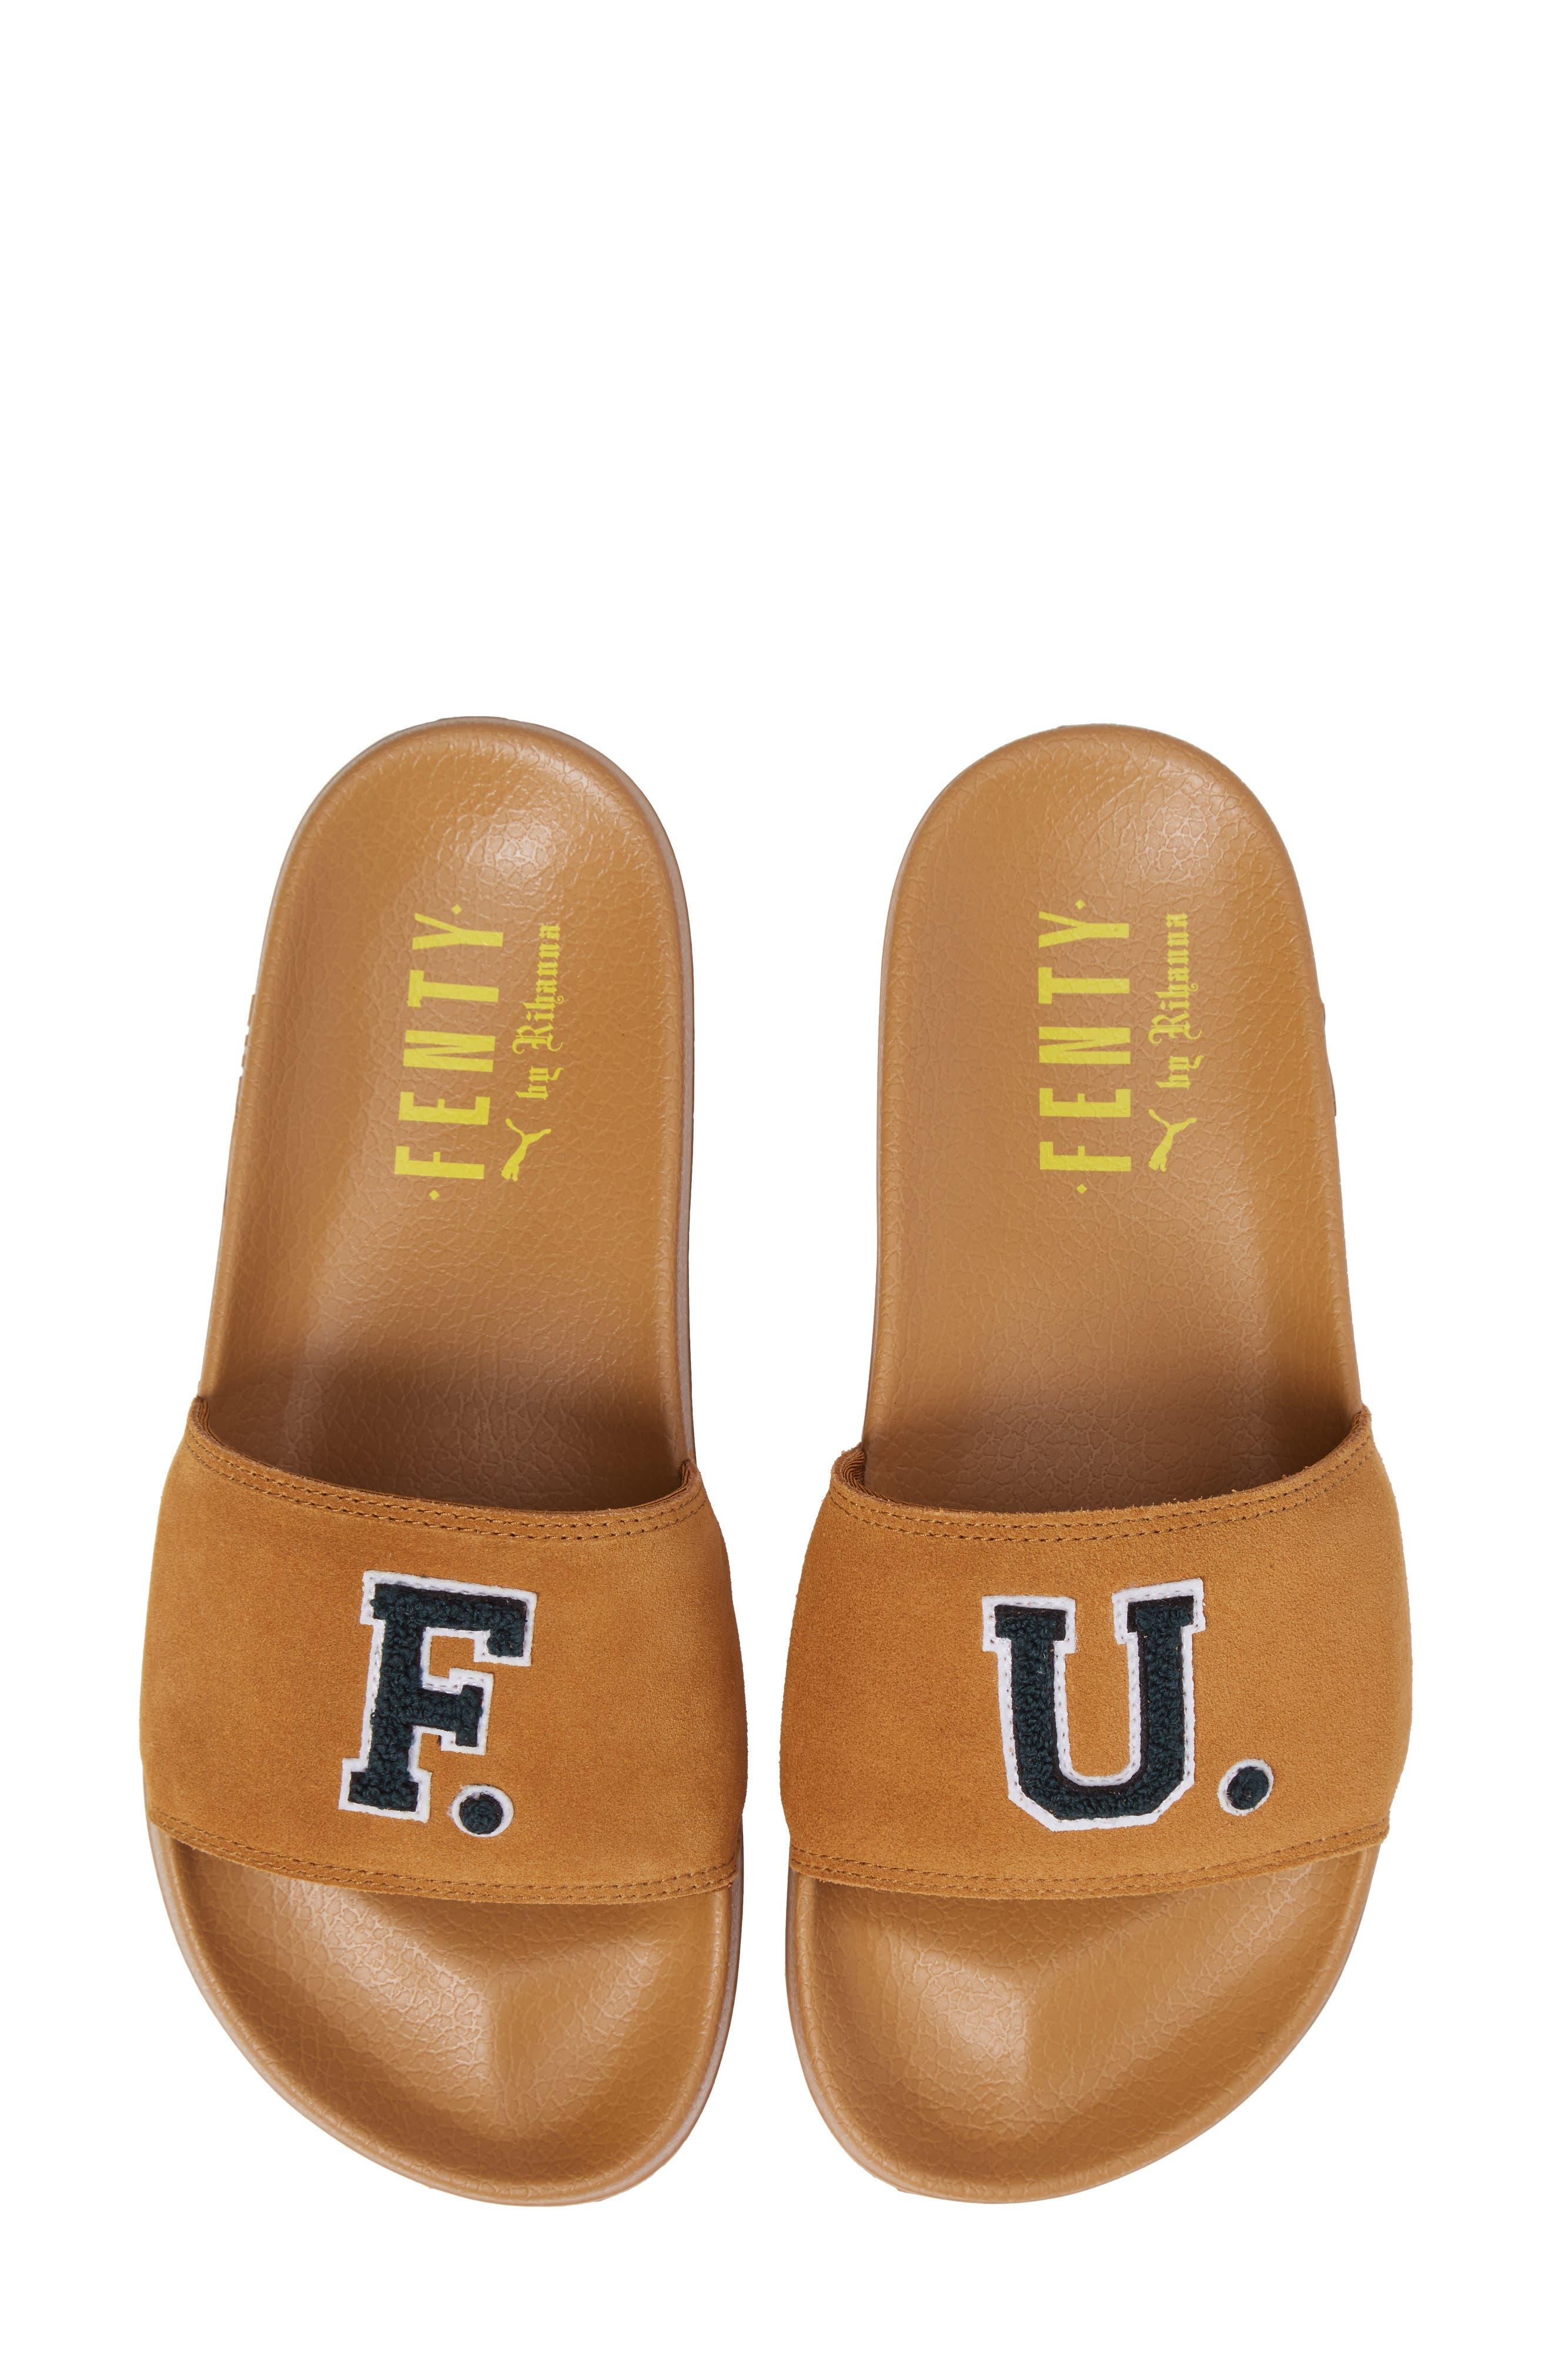 FENTY PUMA by Rihanna Lead Cat Slide Sandals,                             Alternate thumbnail 20, color,